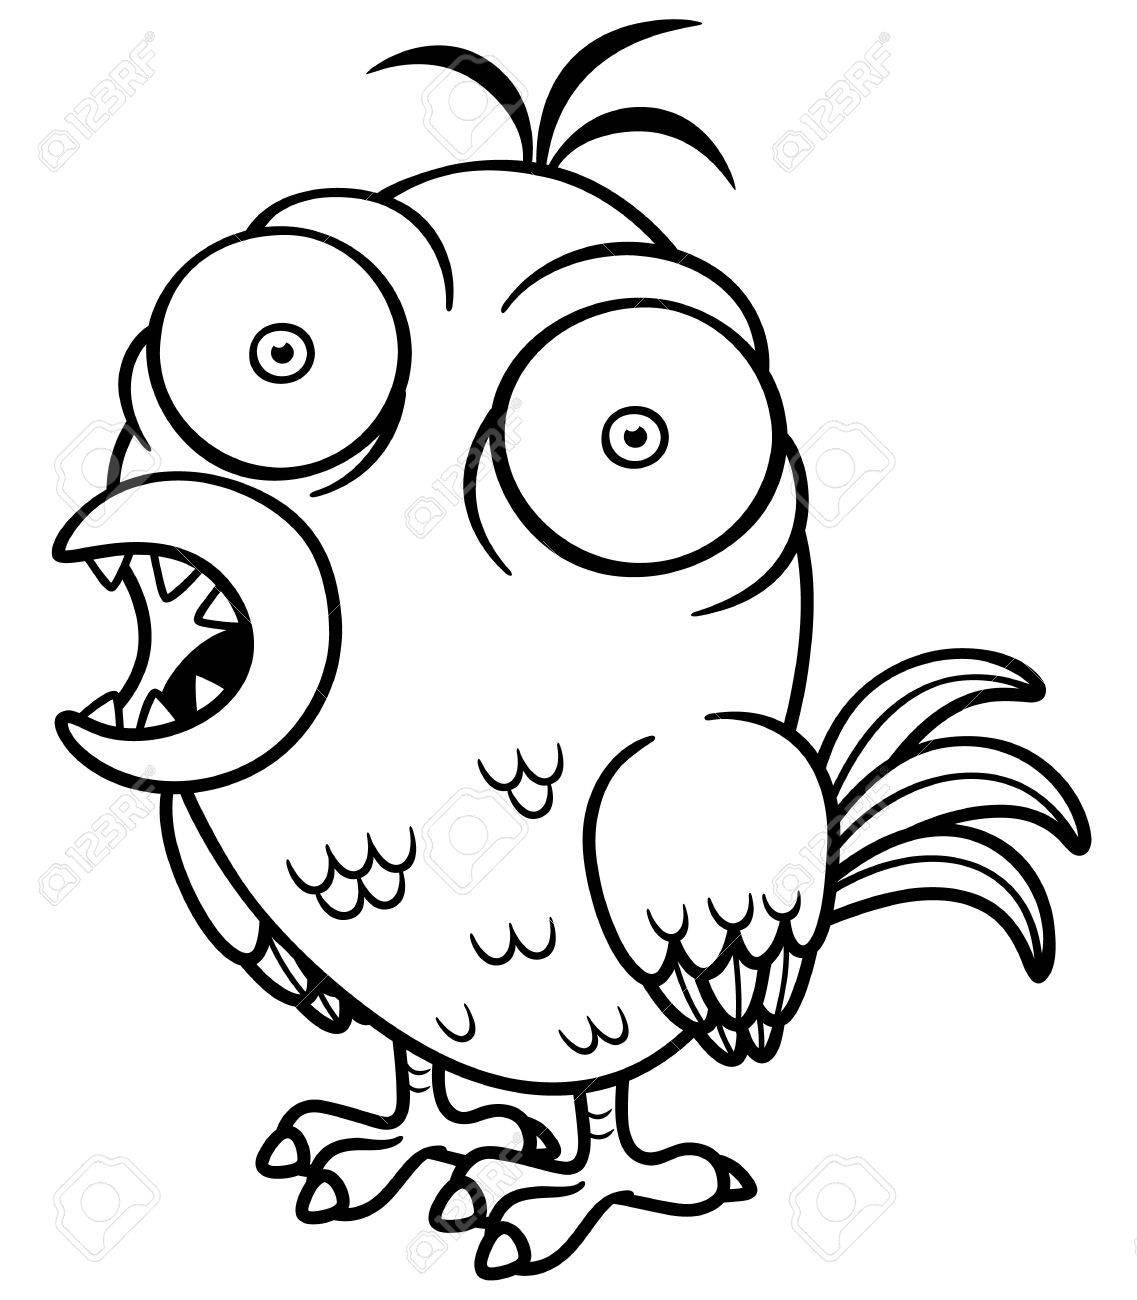 Vector Illustration Of Cartoon Bird - Coloring Book Royalty Free ...